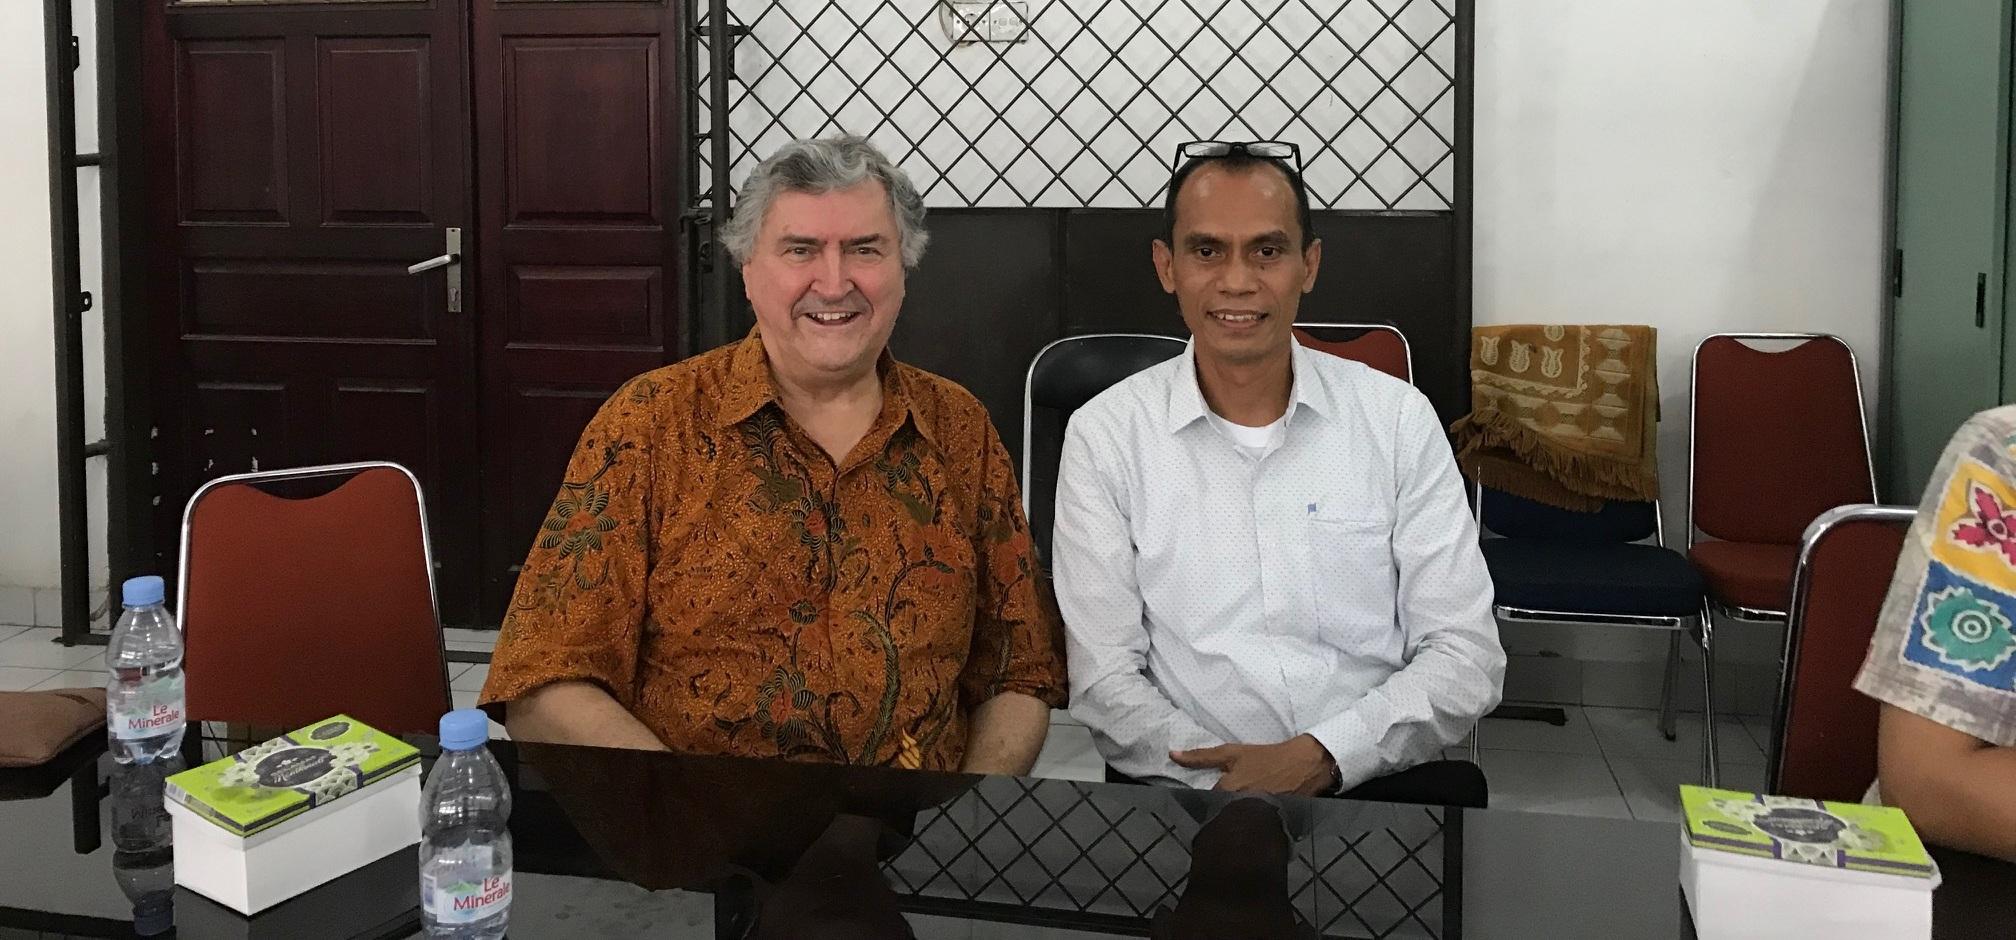 Paul Marshall with Professor Yasrul Huda. Photo courtesy of Paul Marshall.